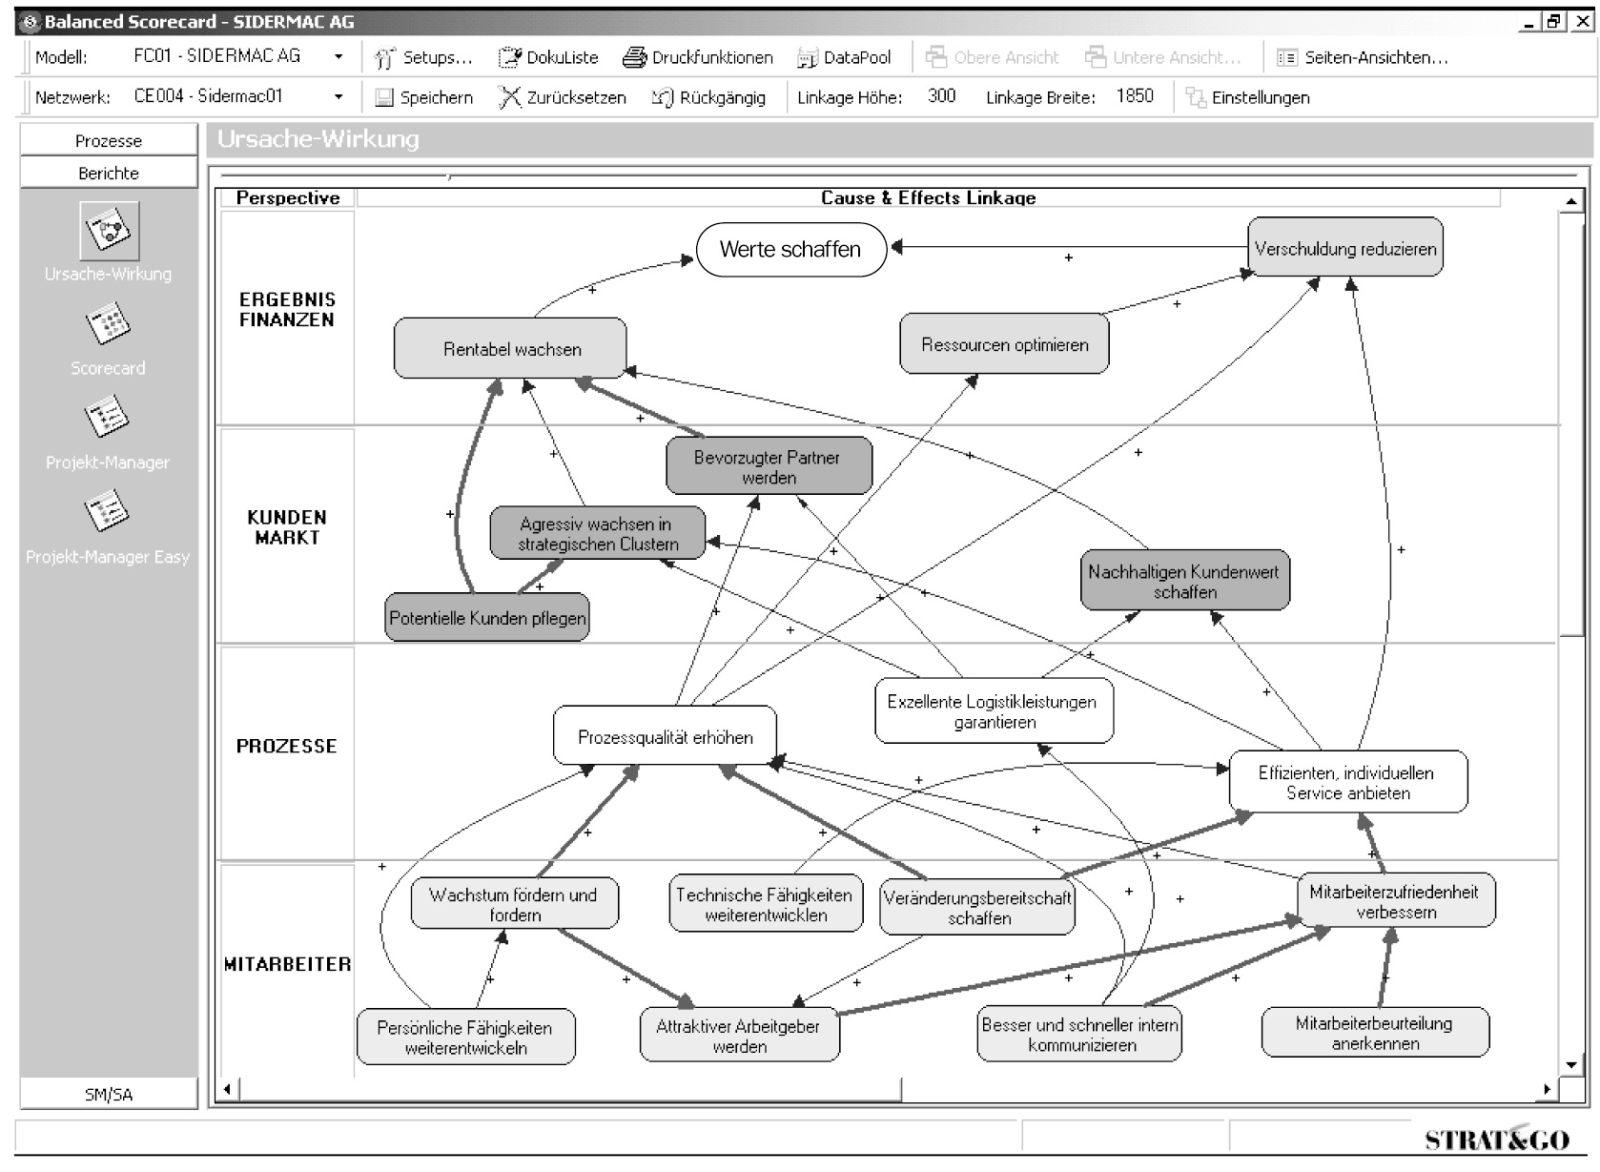 Abb12_Teil2_Ursache-Wirkungs-Diagramm - CA controller akademie